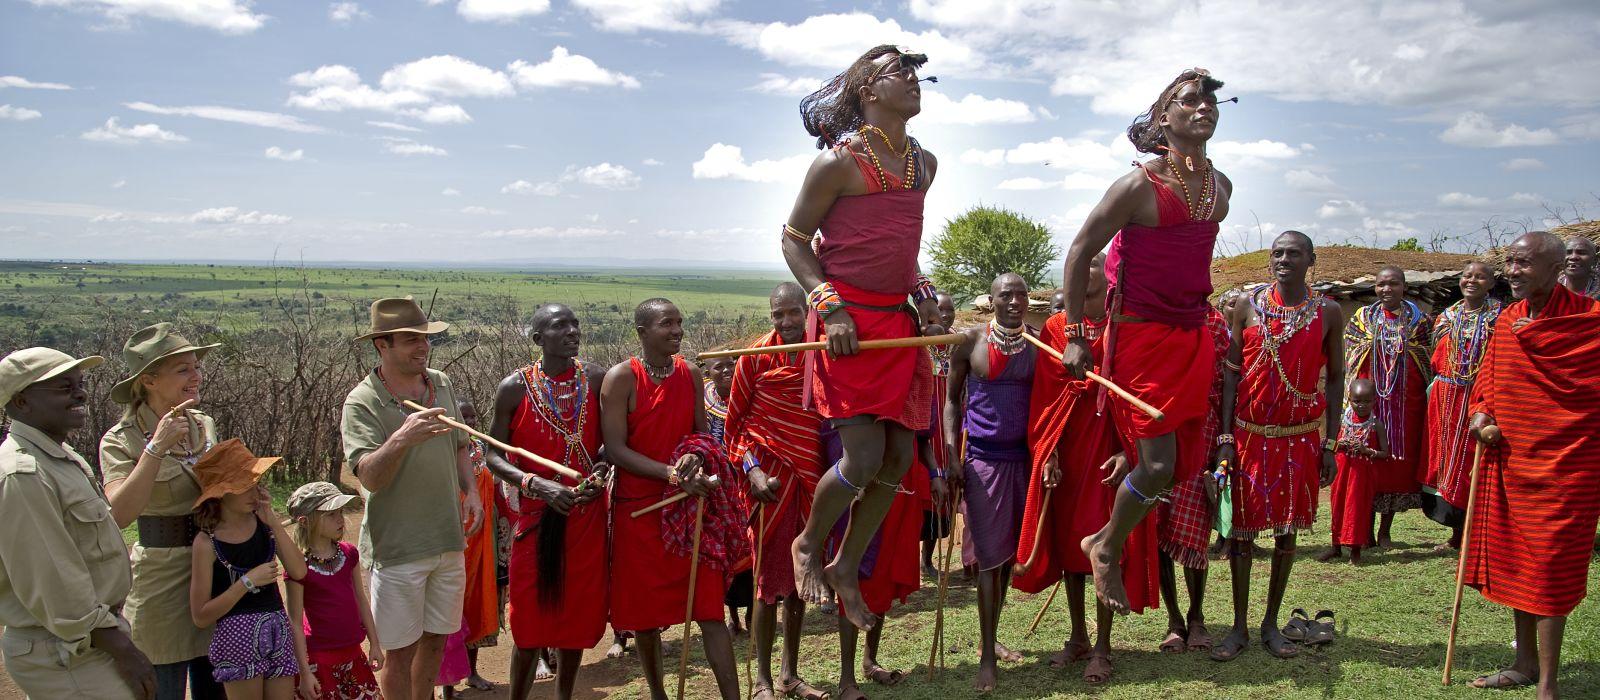 Tansania: Safari & authentische Einblicke Urlaub 4